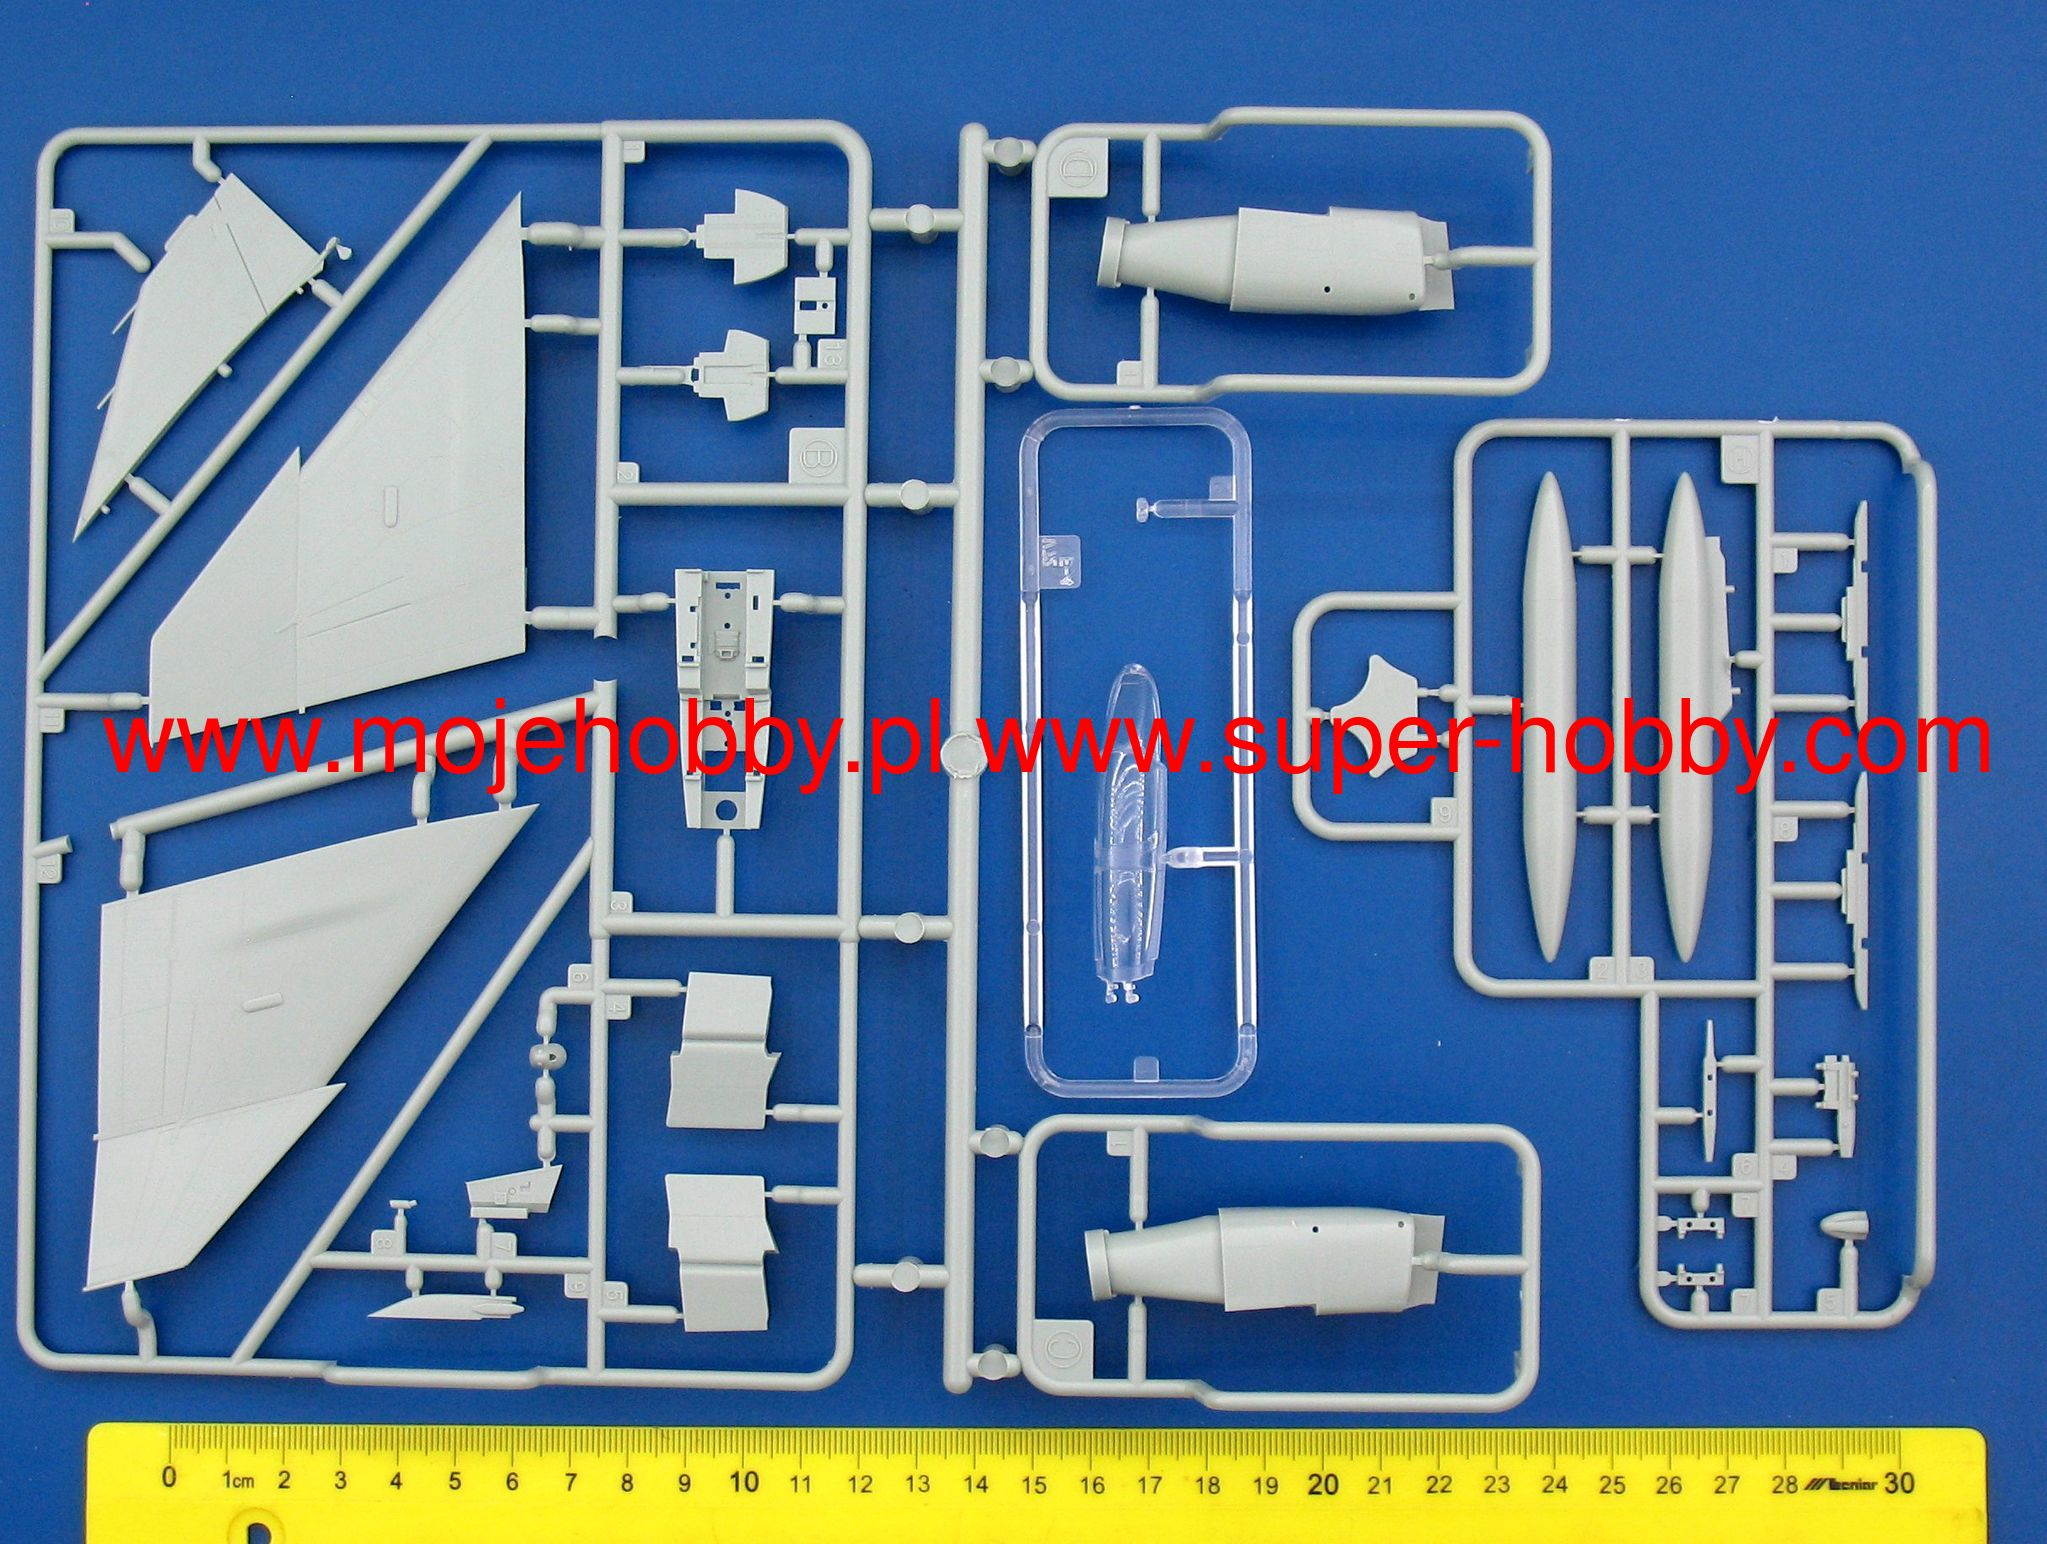 Red Devil 5400 Wiring Diagram Free Download John Deere F 4j Vfma 232 Devils Academy 12556 At